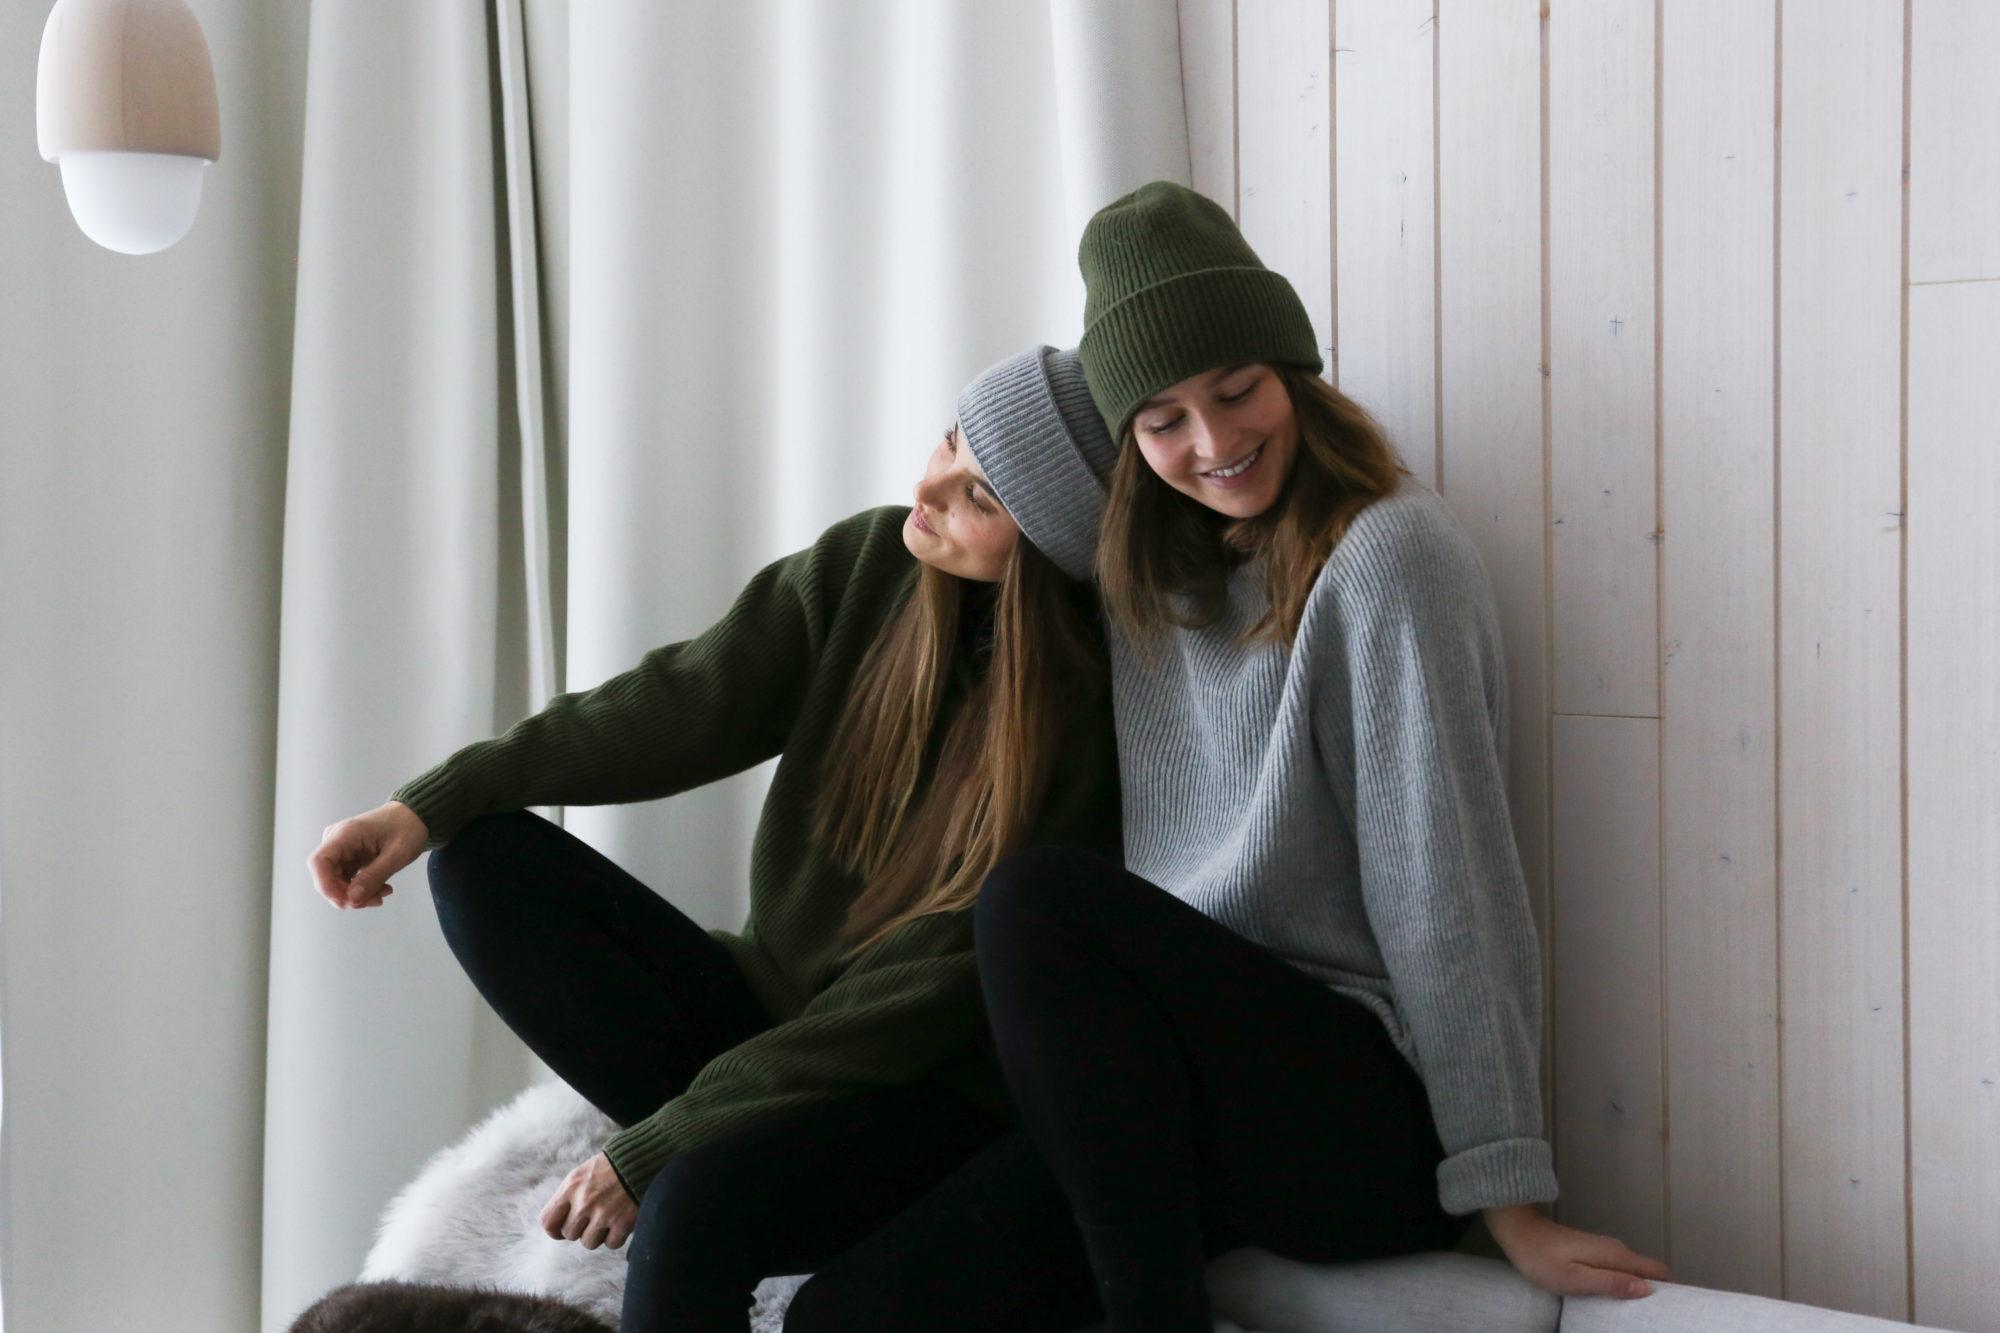 Didem ja Emilia sohvalla.